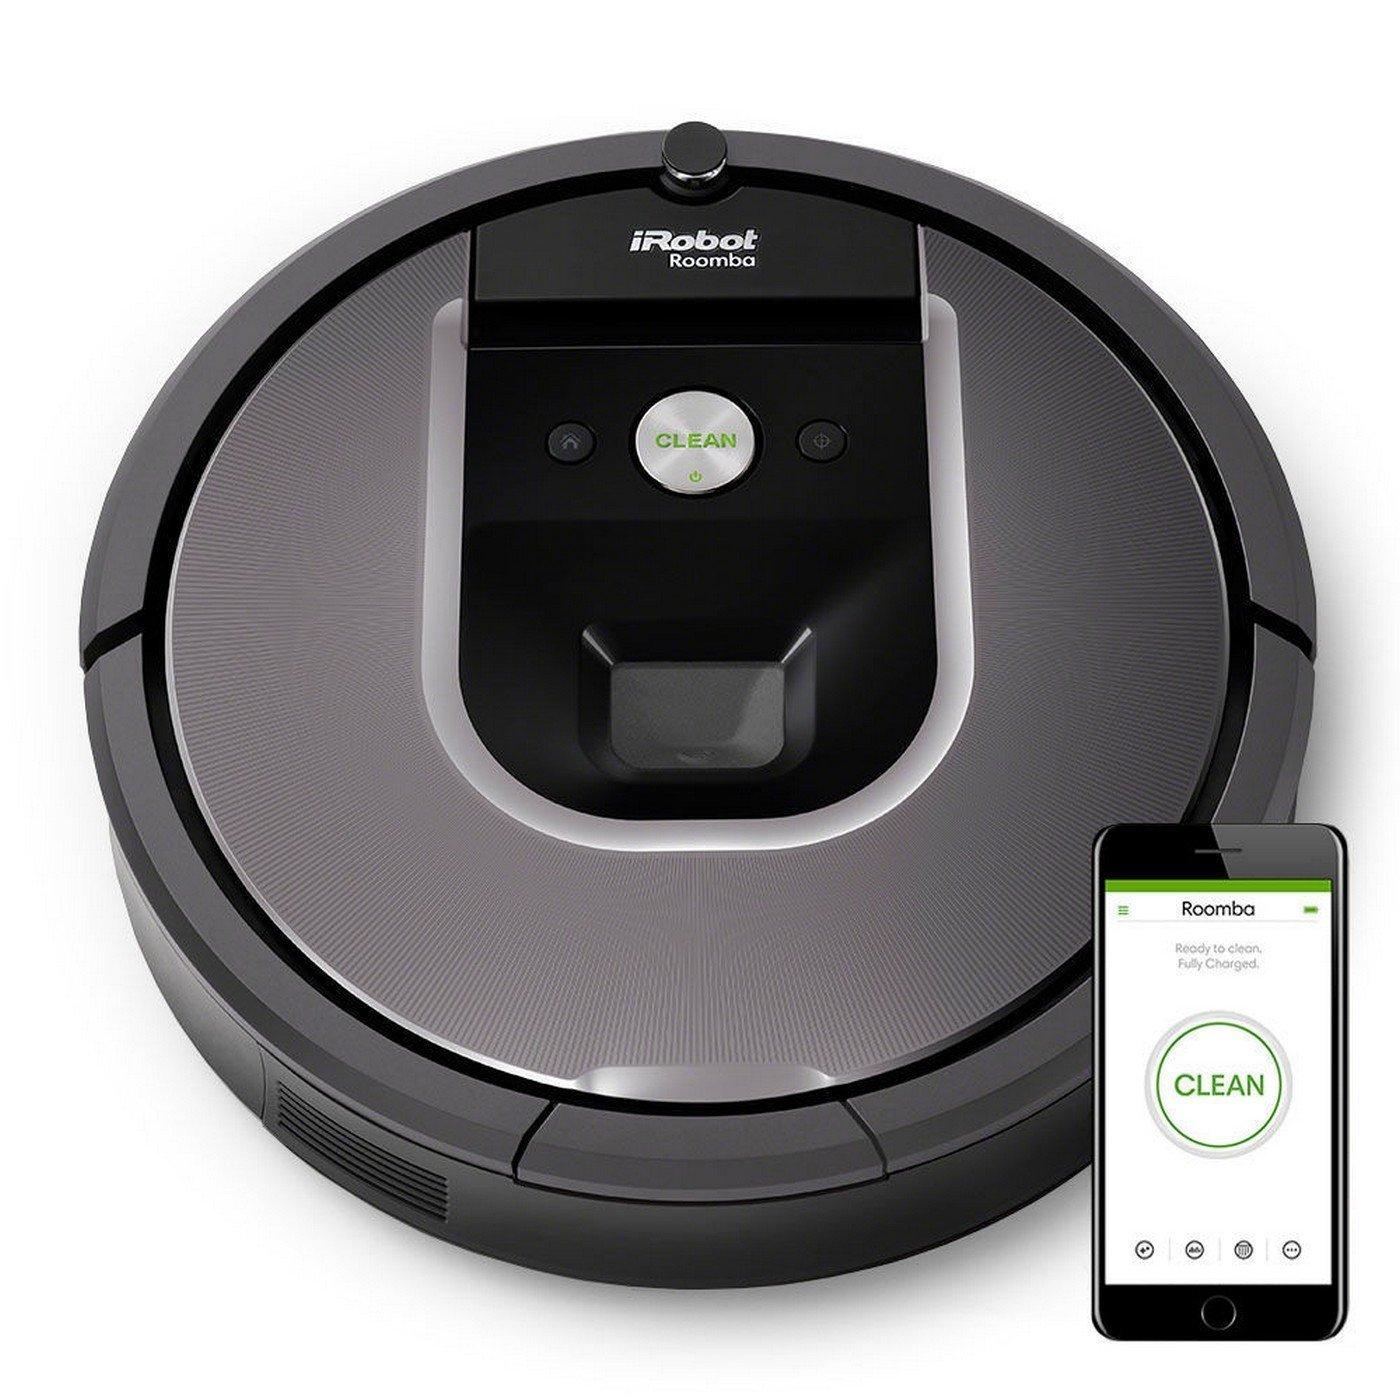 [WHD] Roomba 960 Saugroboter selbstnavigierend. Gebraucht, sehr gut in Warehouse Deals